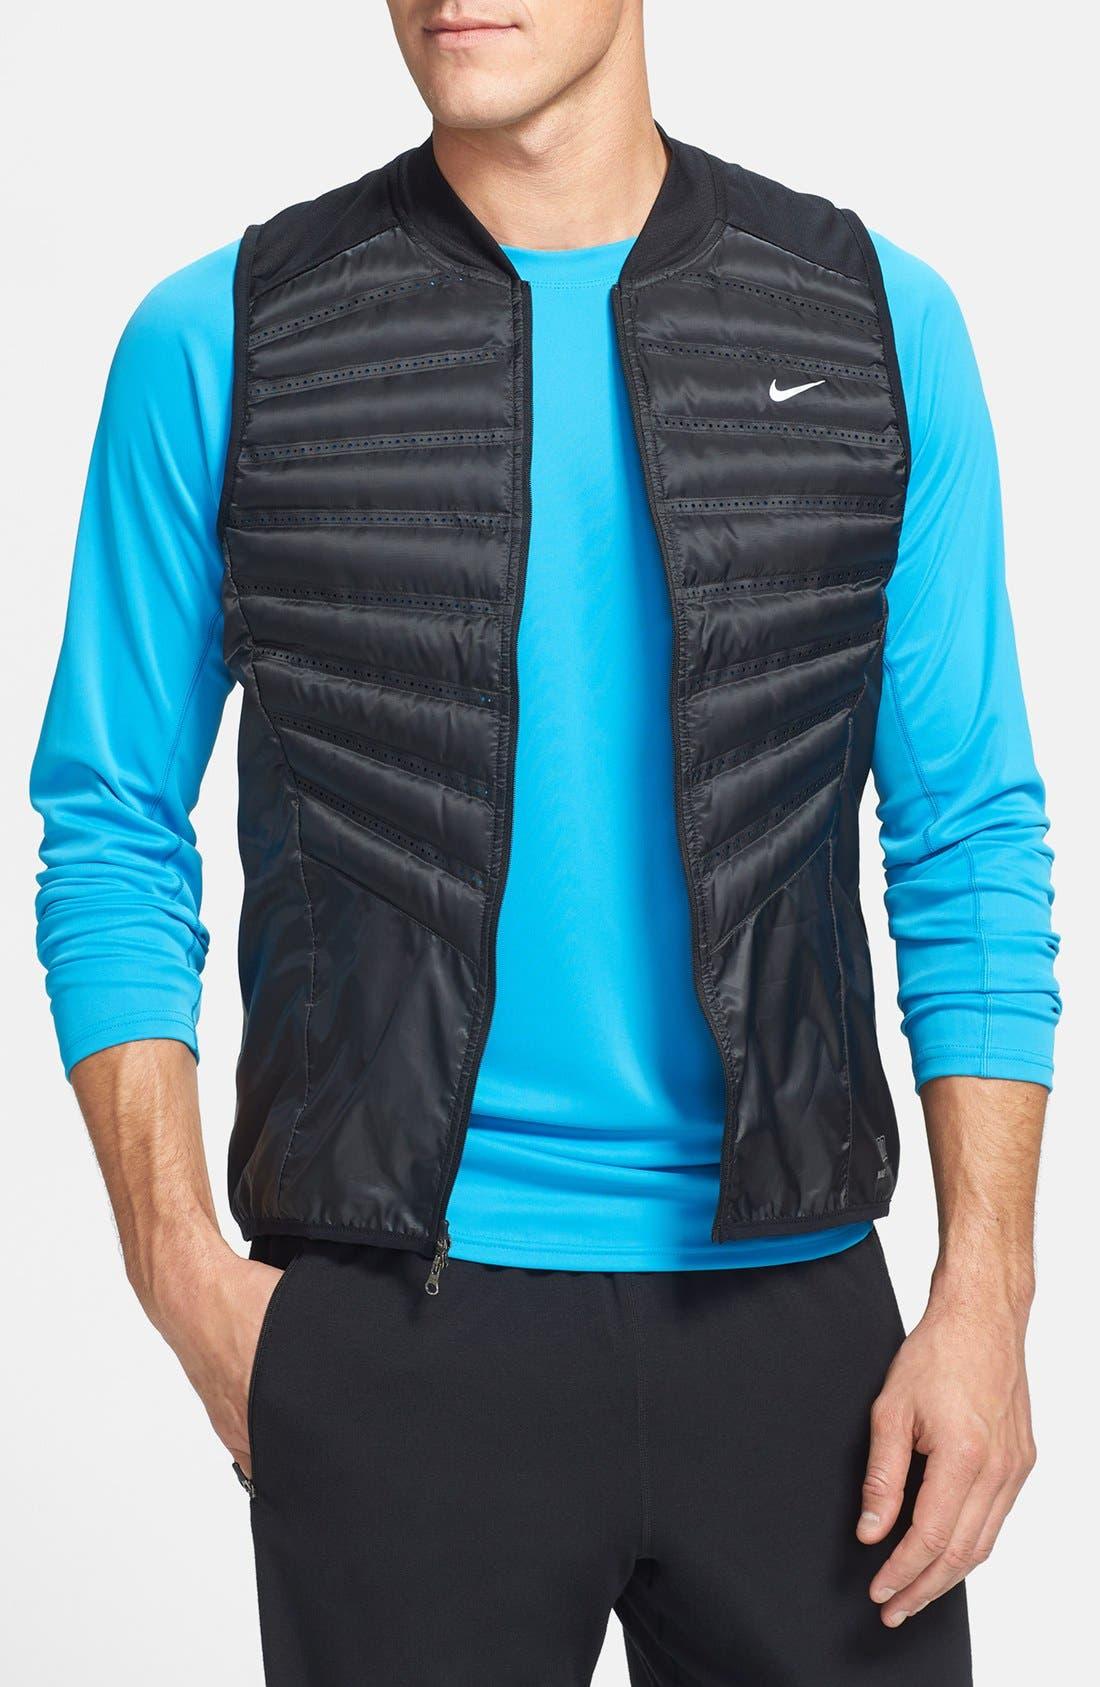 Main Image - Nike 'Aeroloft' Insulated Running Vest